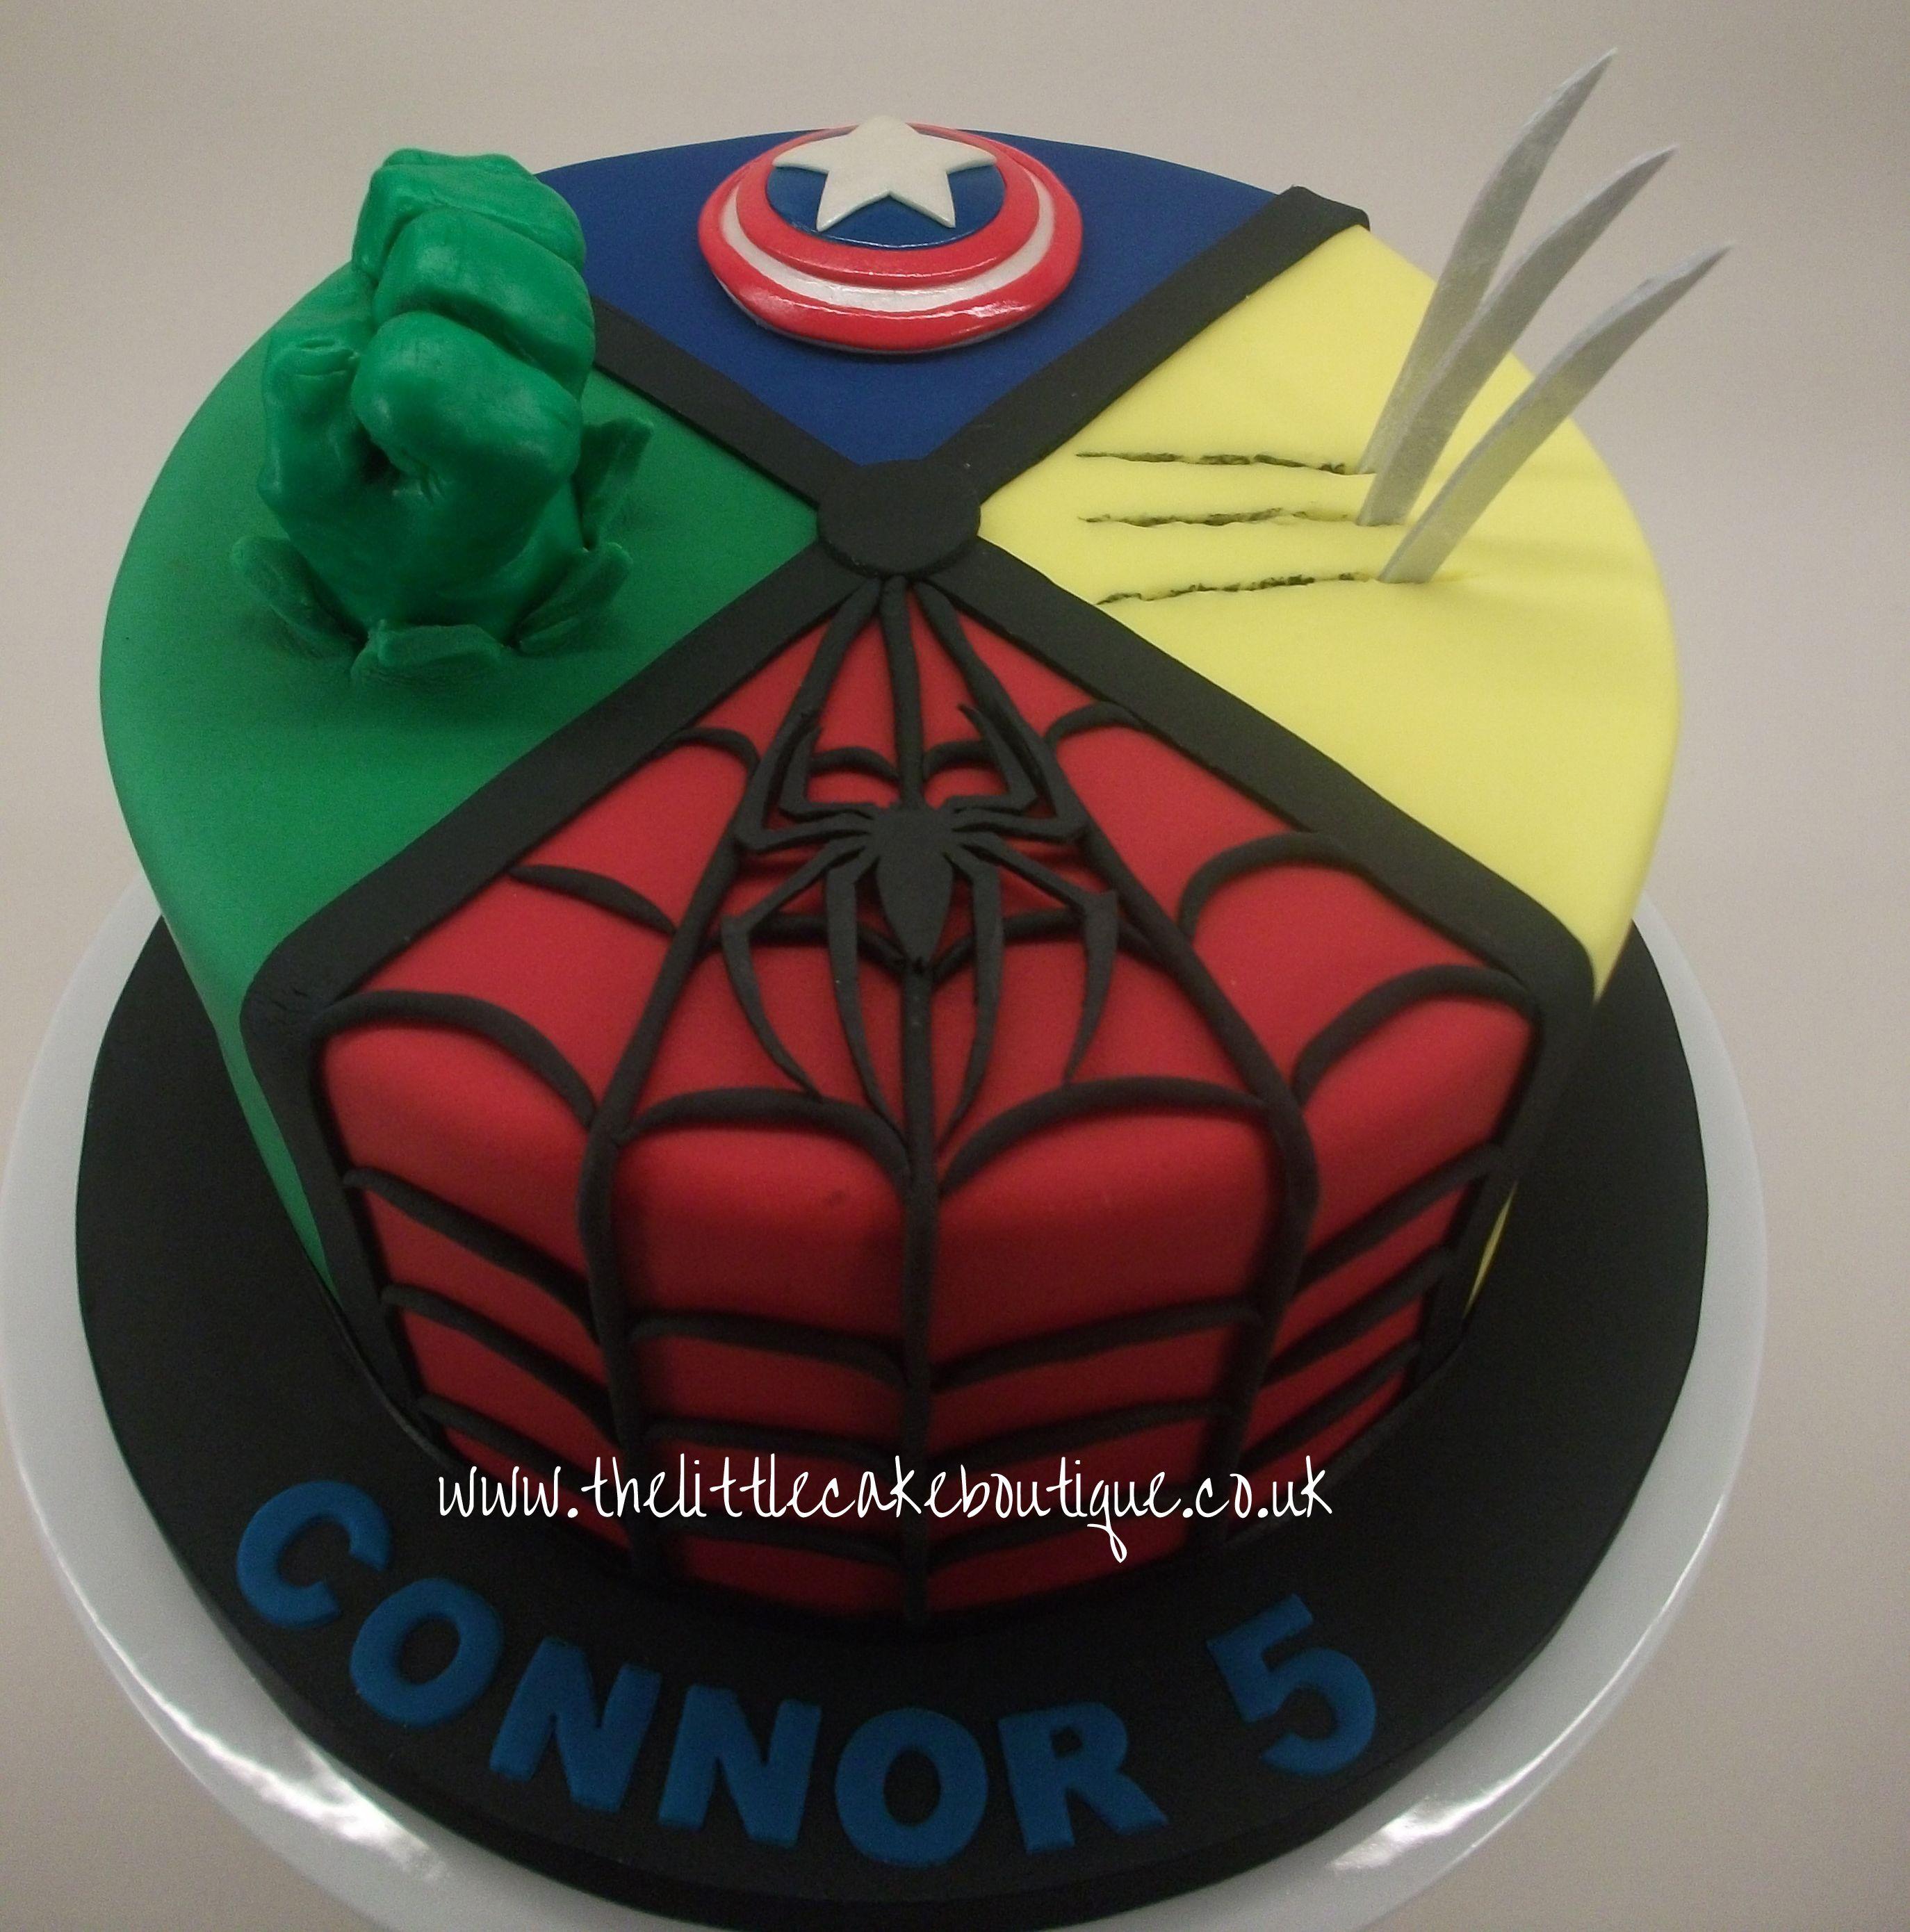 Marvel Avengers Birthday Cake With Hulk Fist Wolverine